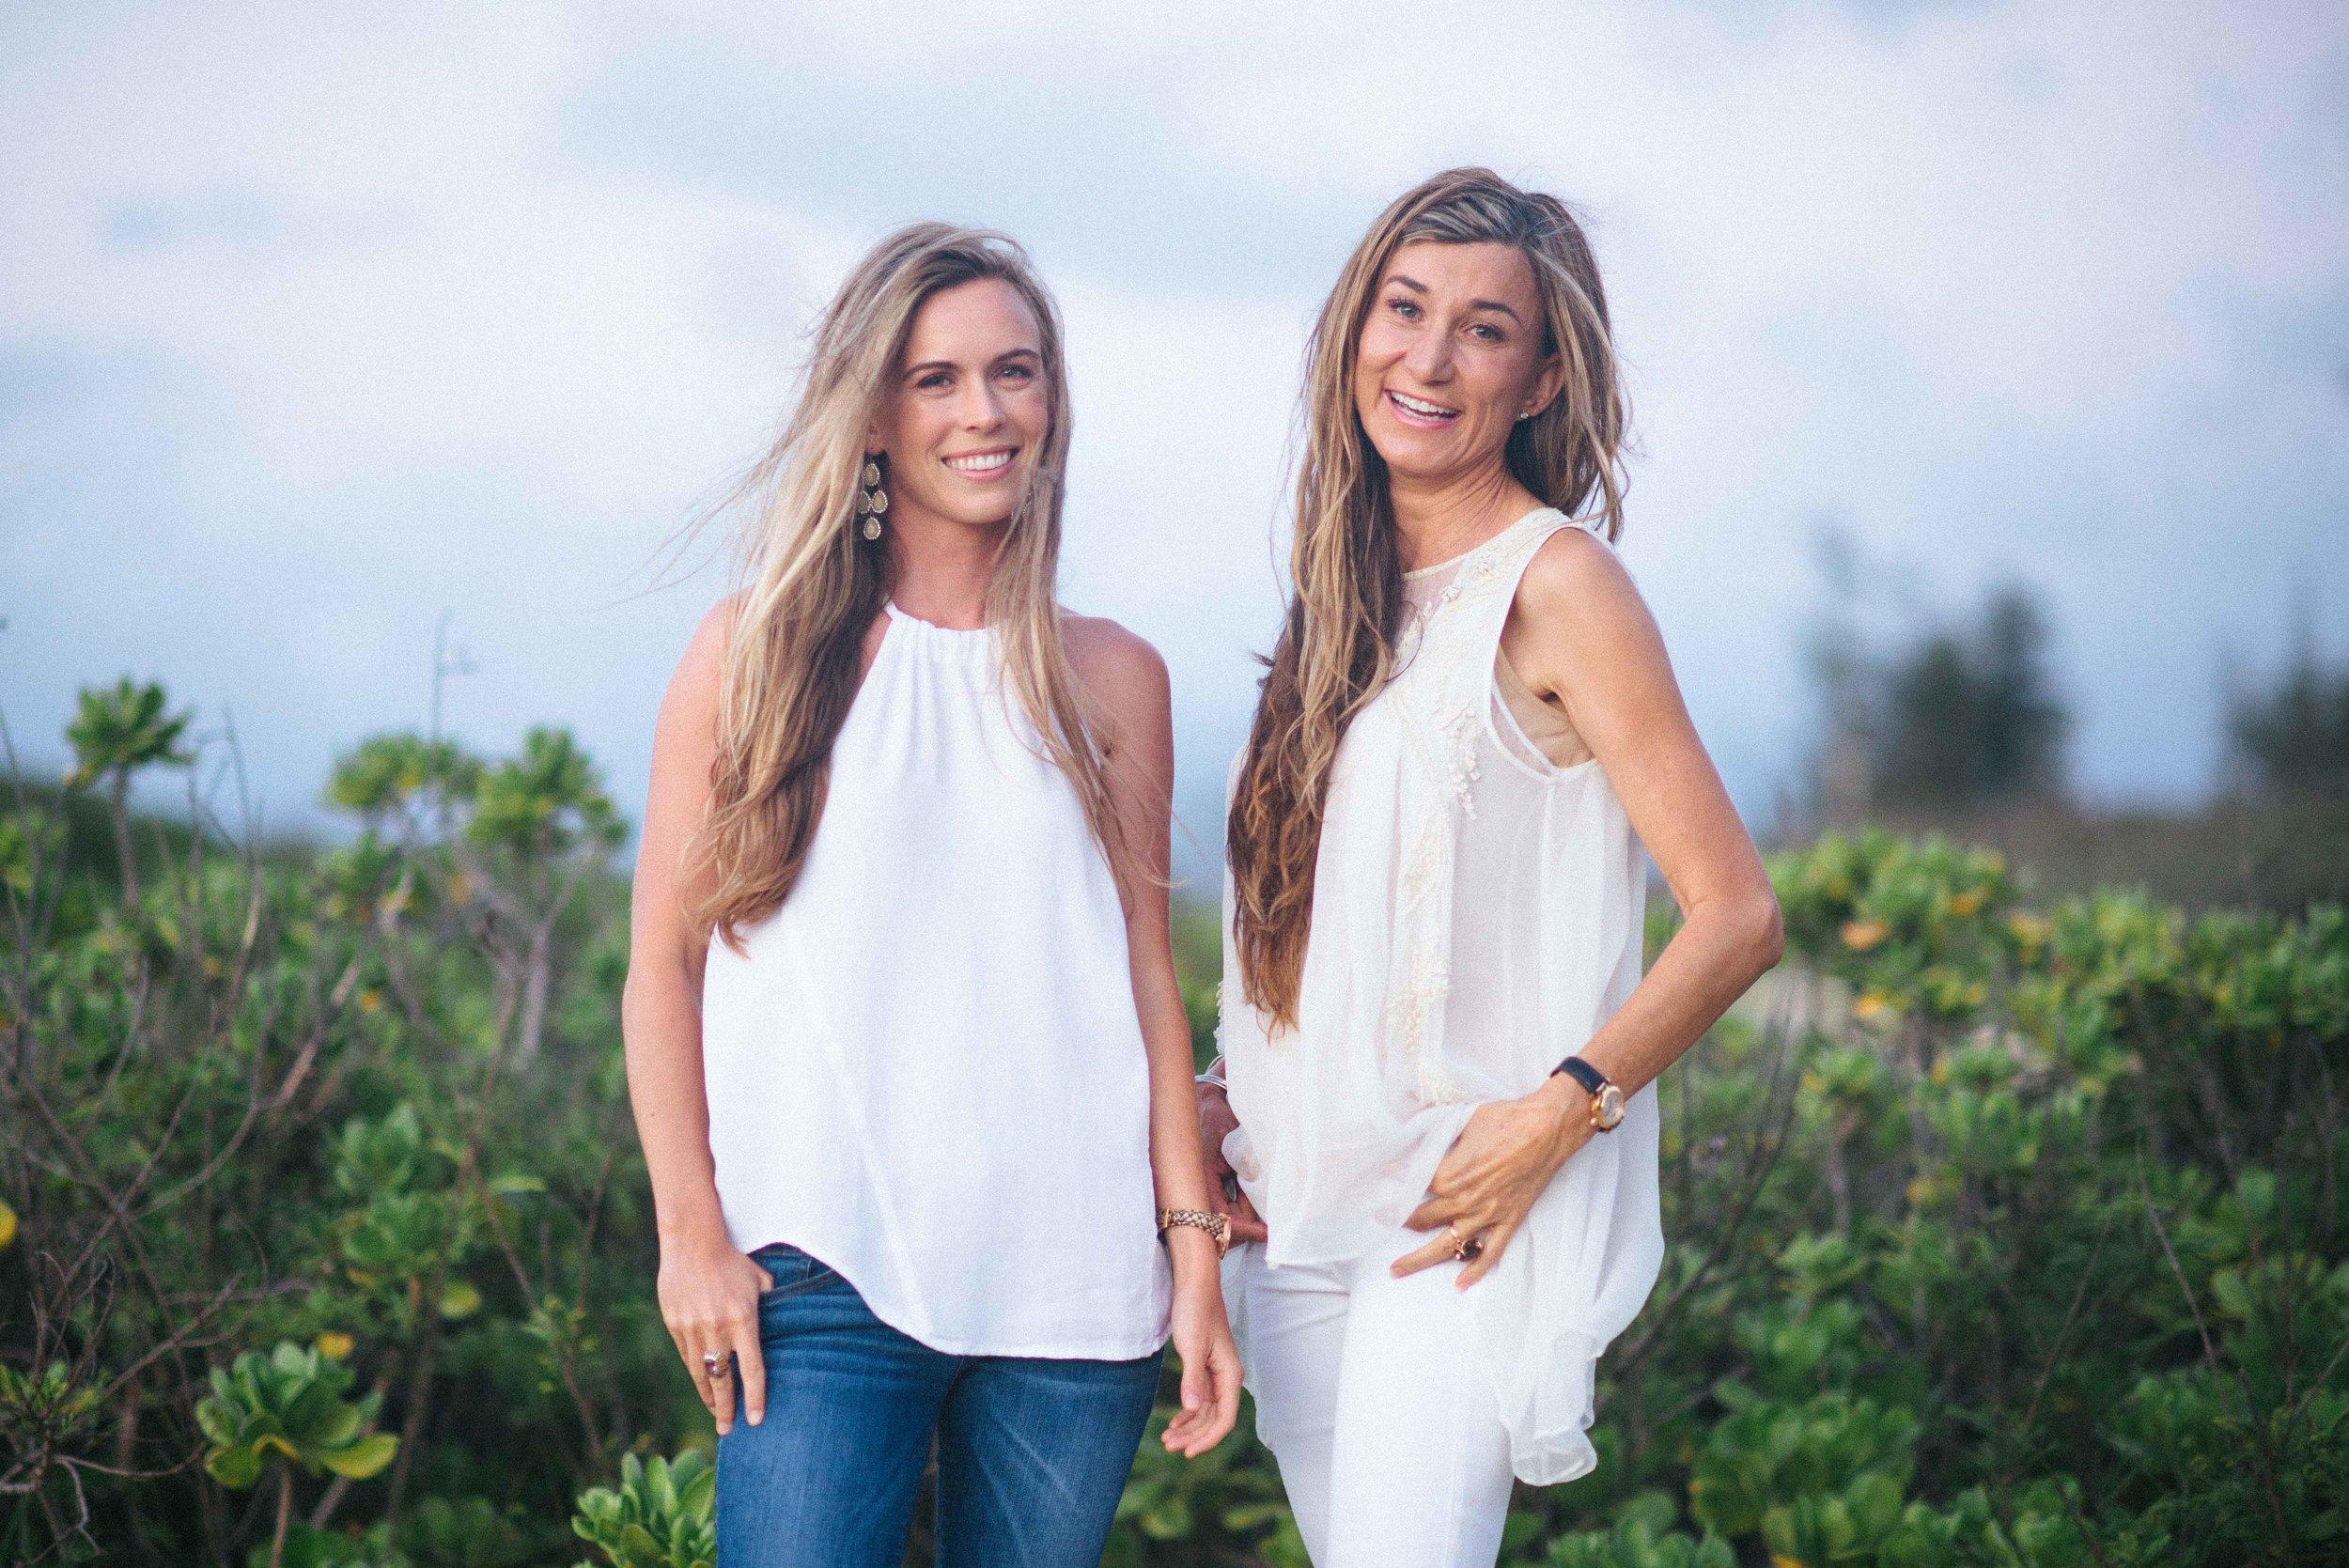 Oahu-Wedding-Photographers-Stefanie-Anna